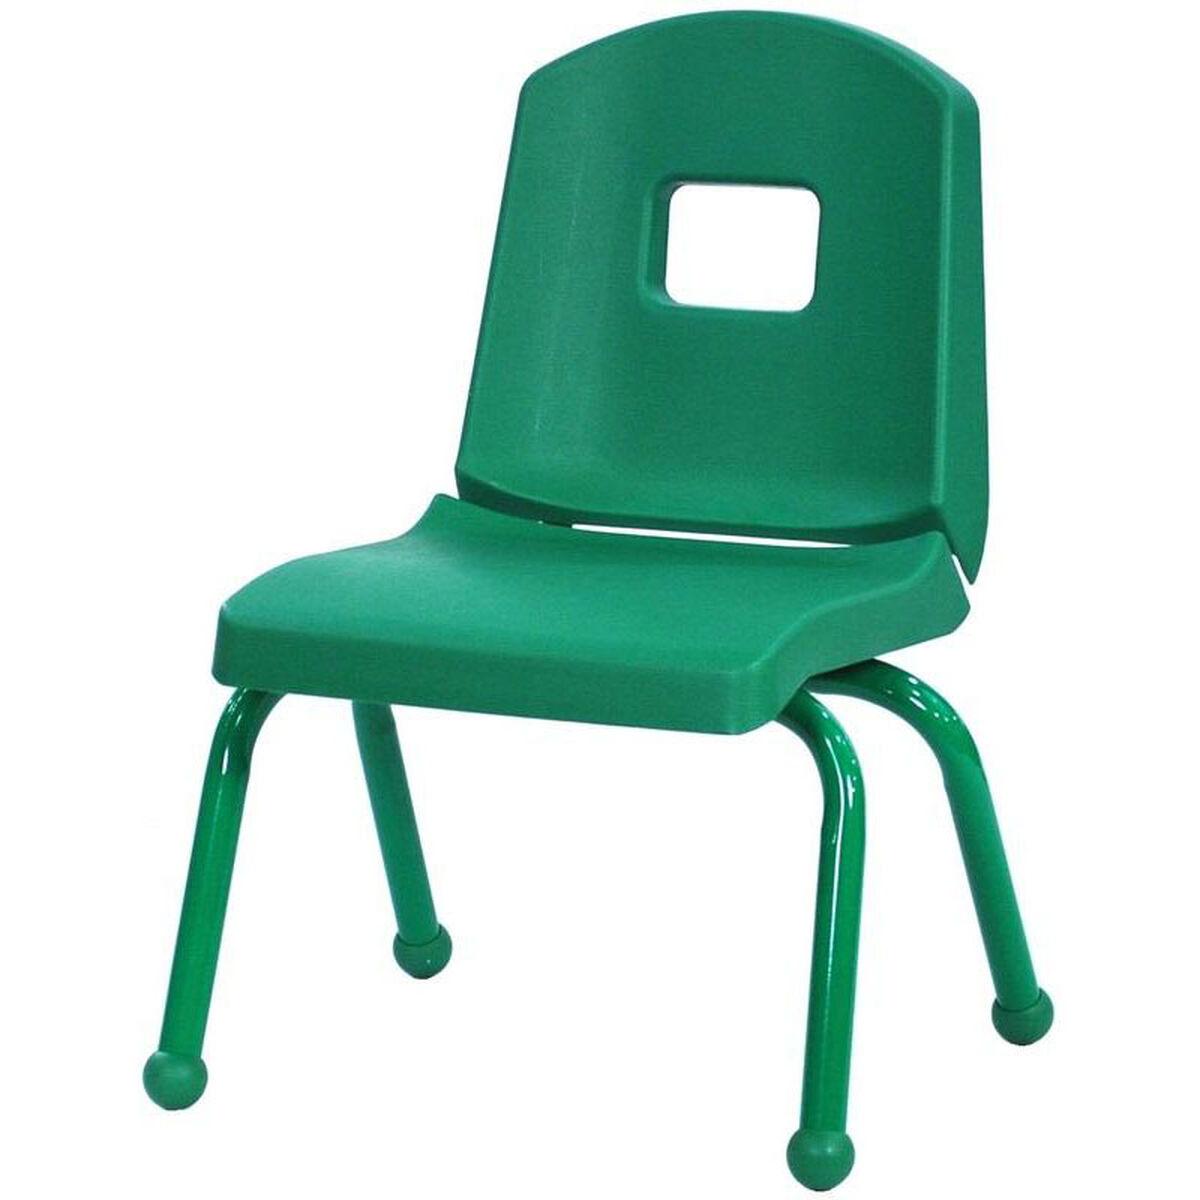 green split bucket stack chair 12chrb dg bizchair com